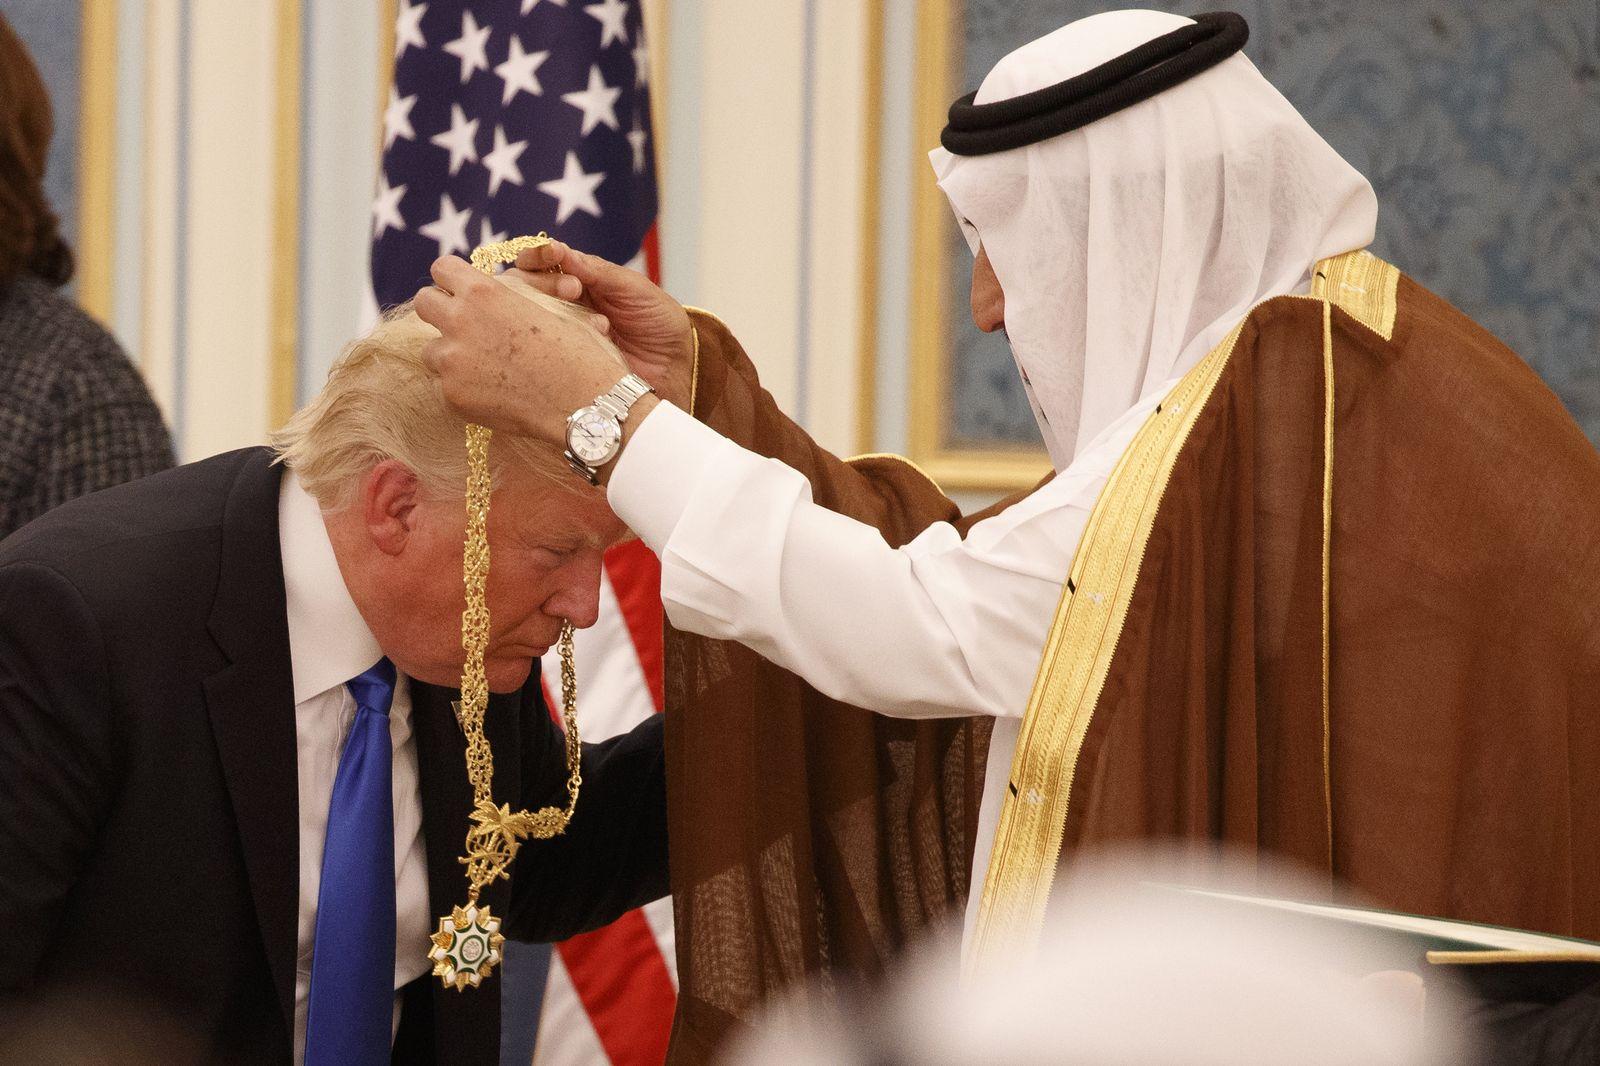 Donald Trump / Reise / Saudi-Arabien